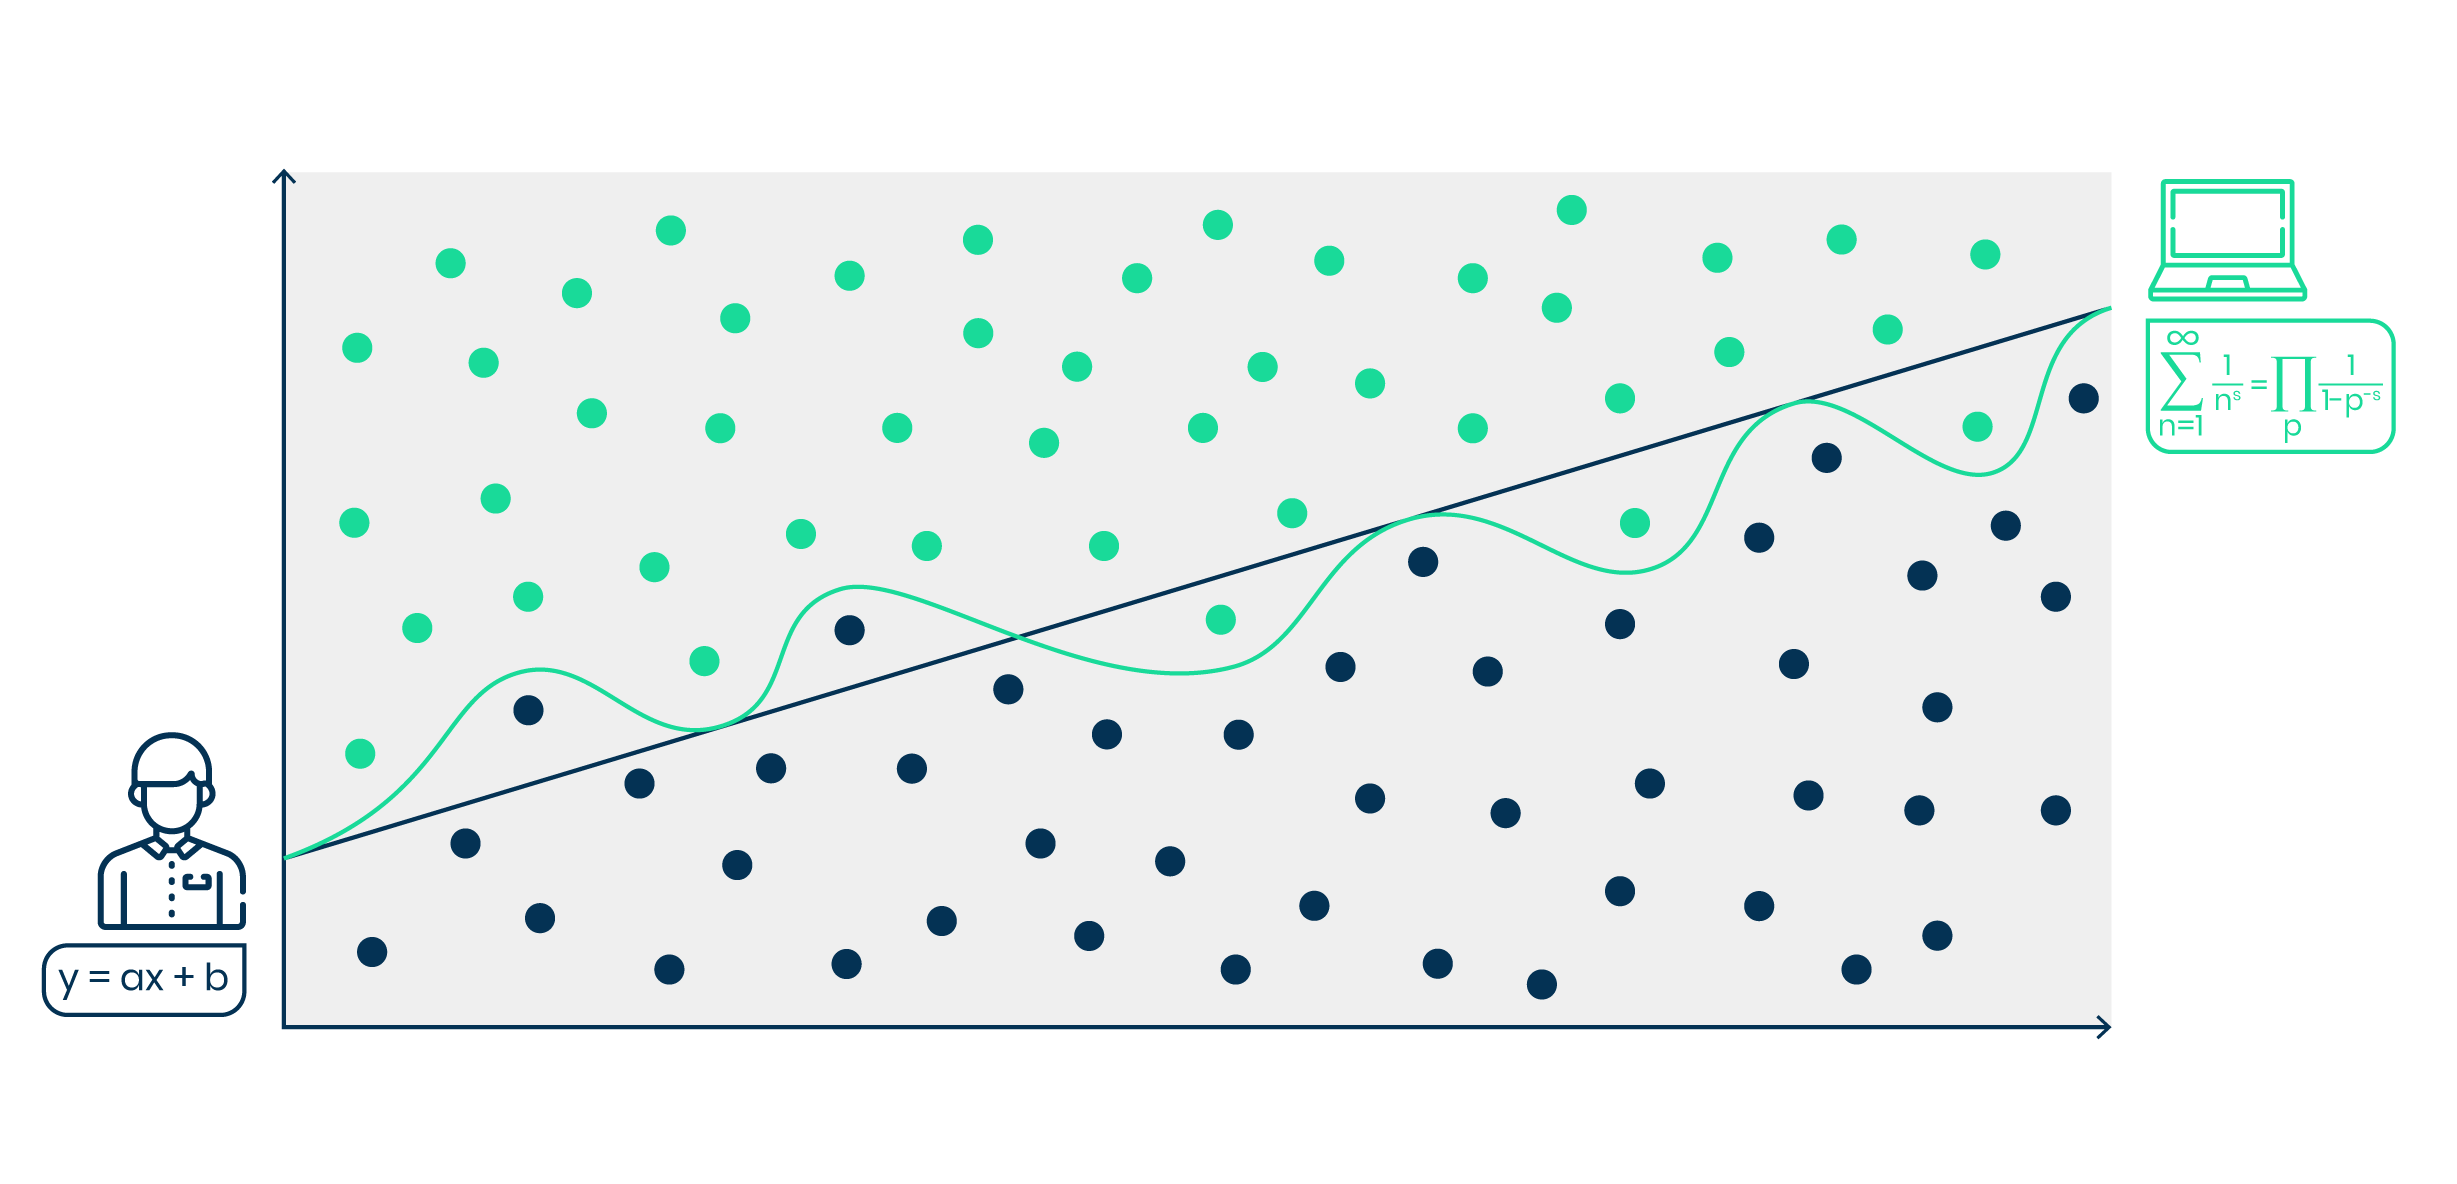 Schéma processus machine learning